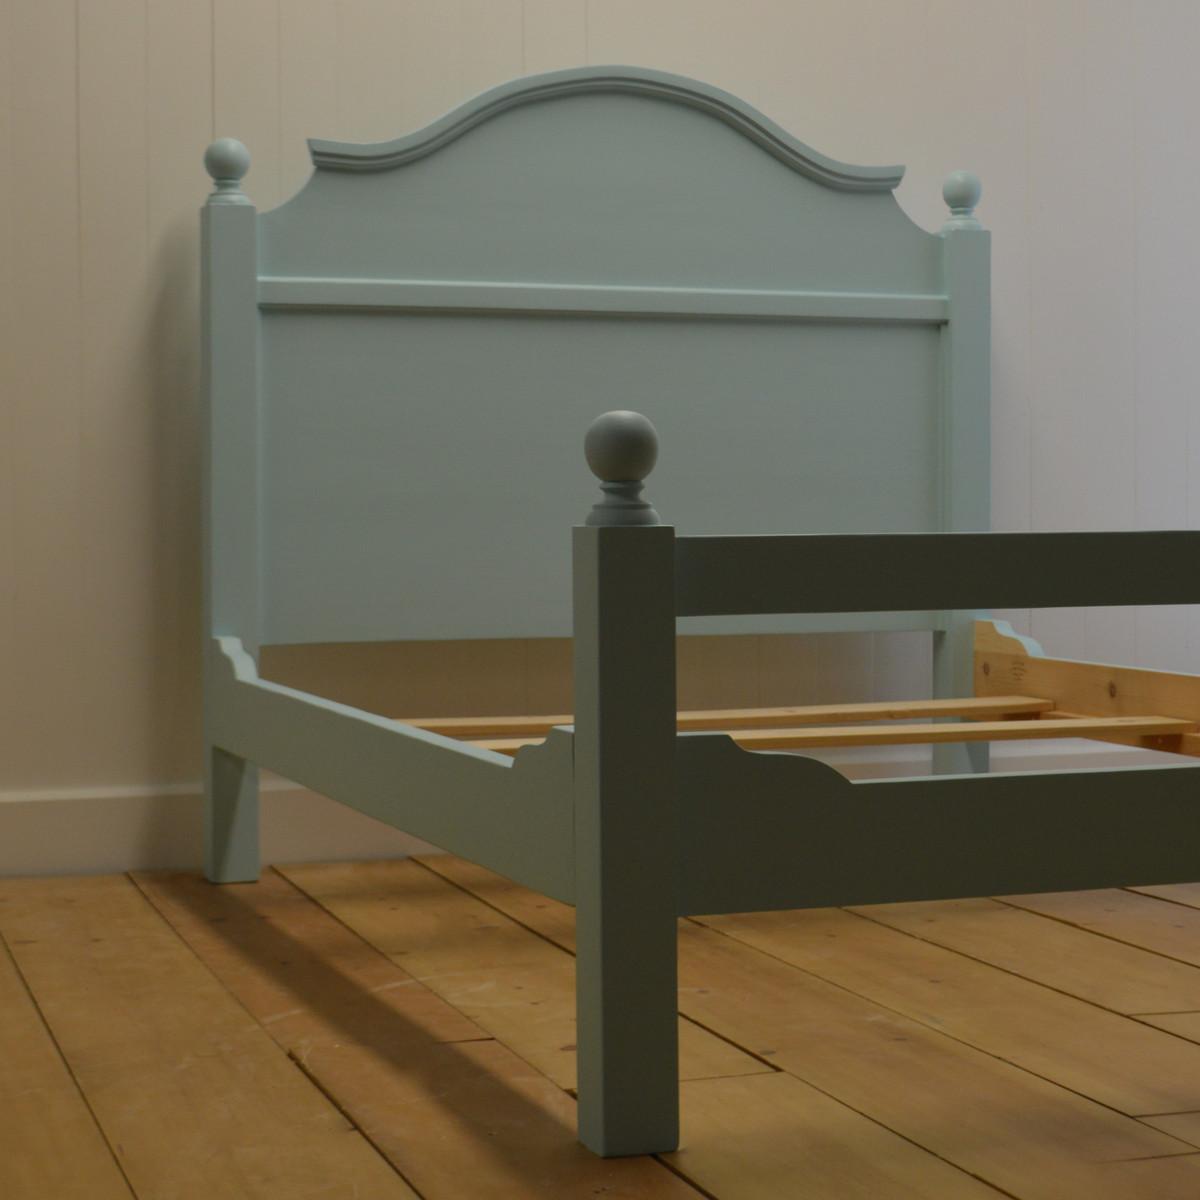 French Farm Bed English Farmhouse Bed Ann Bradshaw Kirchofer